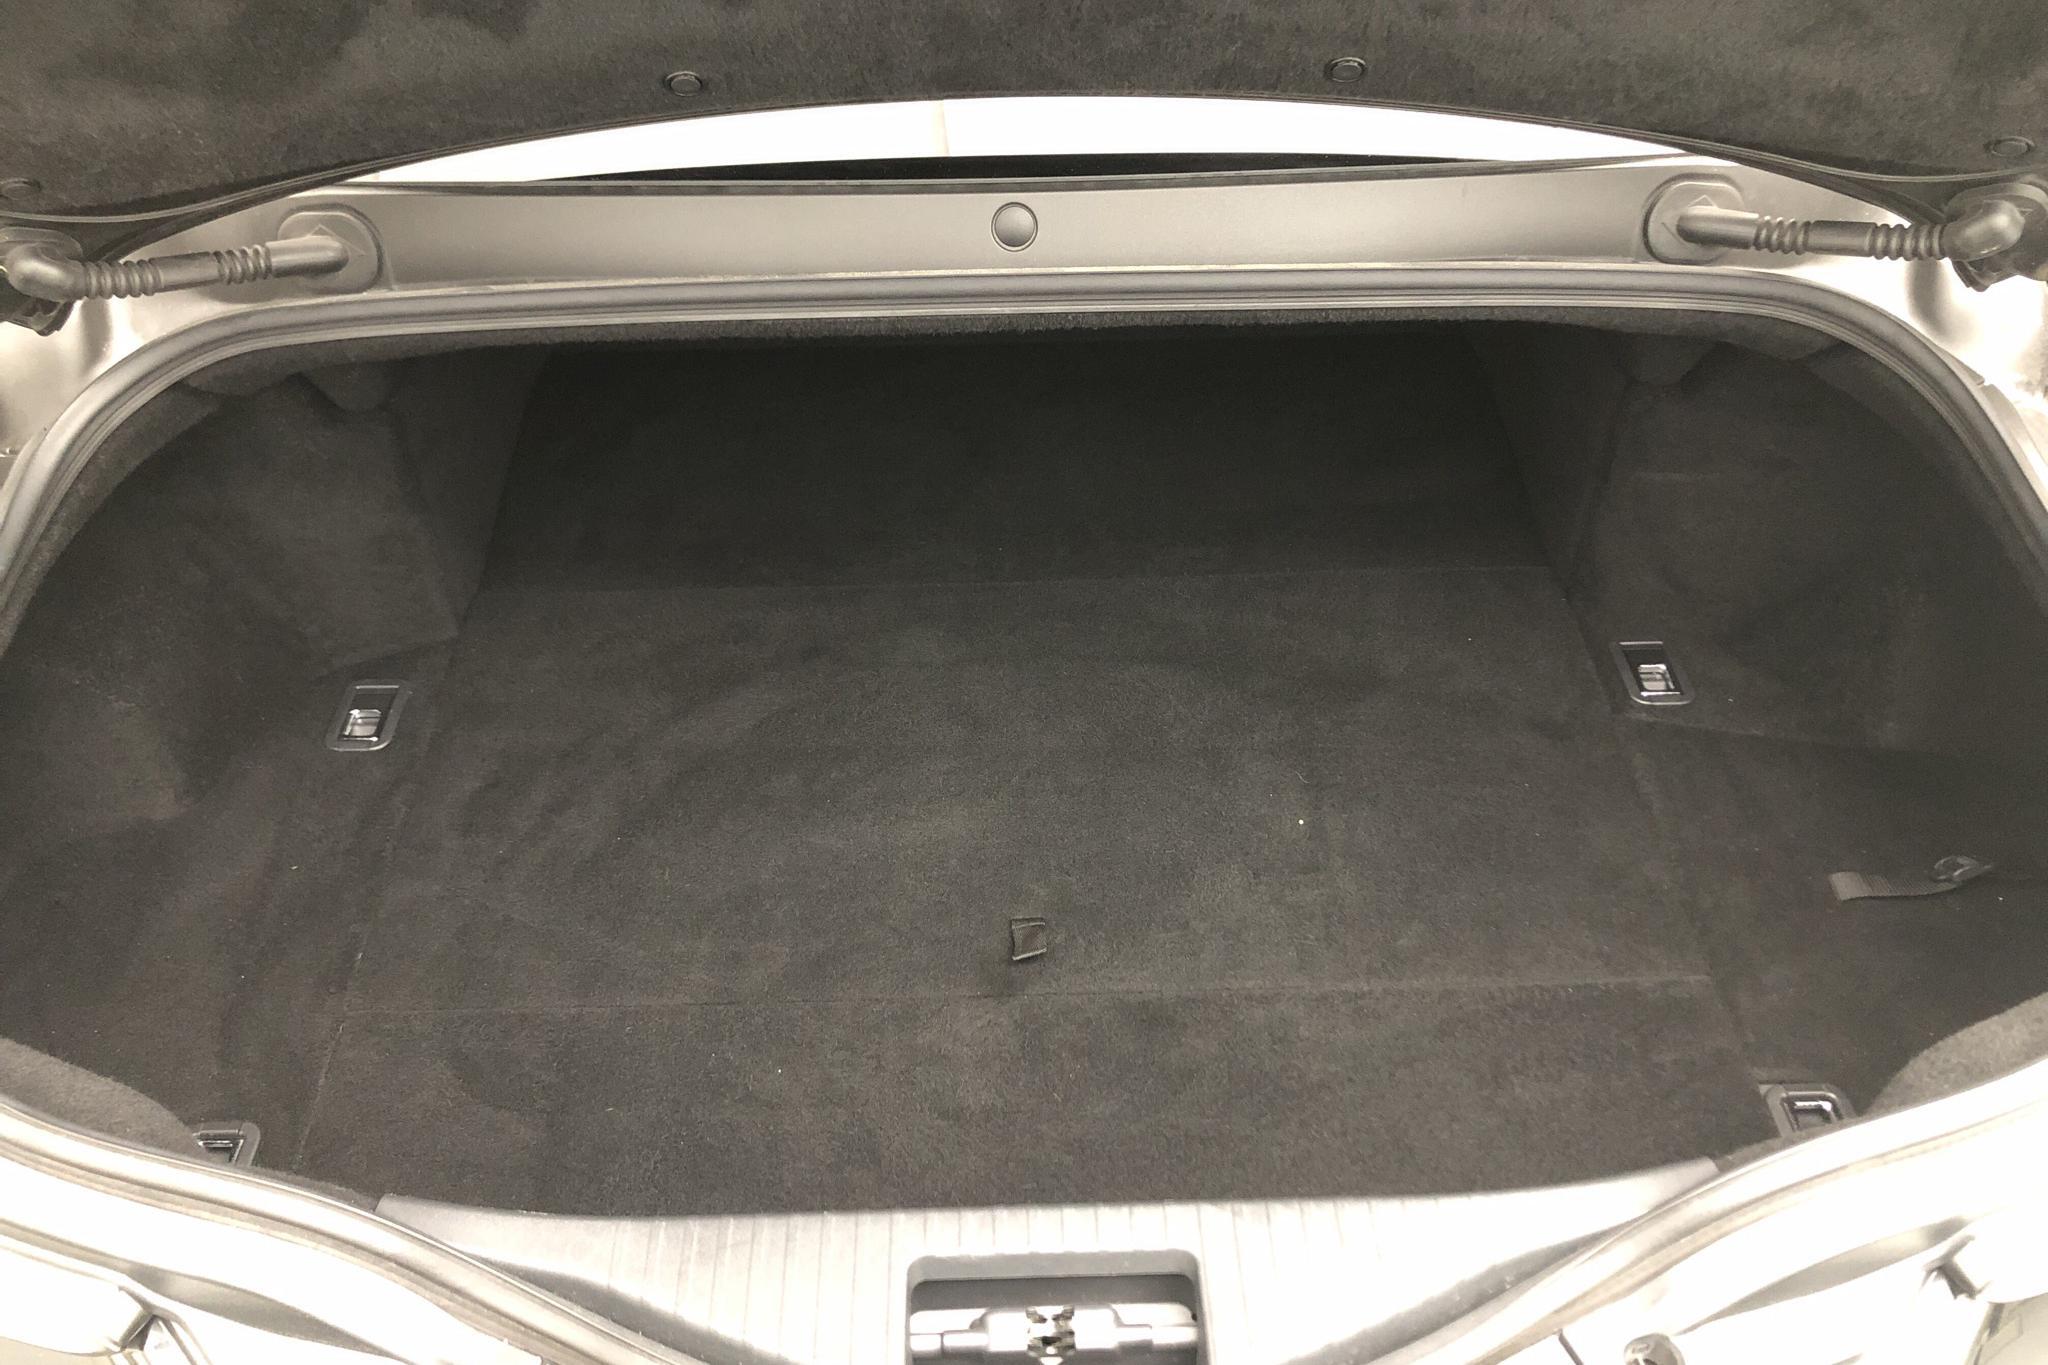 Lexus LC 500 (477hk) - 83 070 km - Automatic - black - 2017